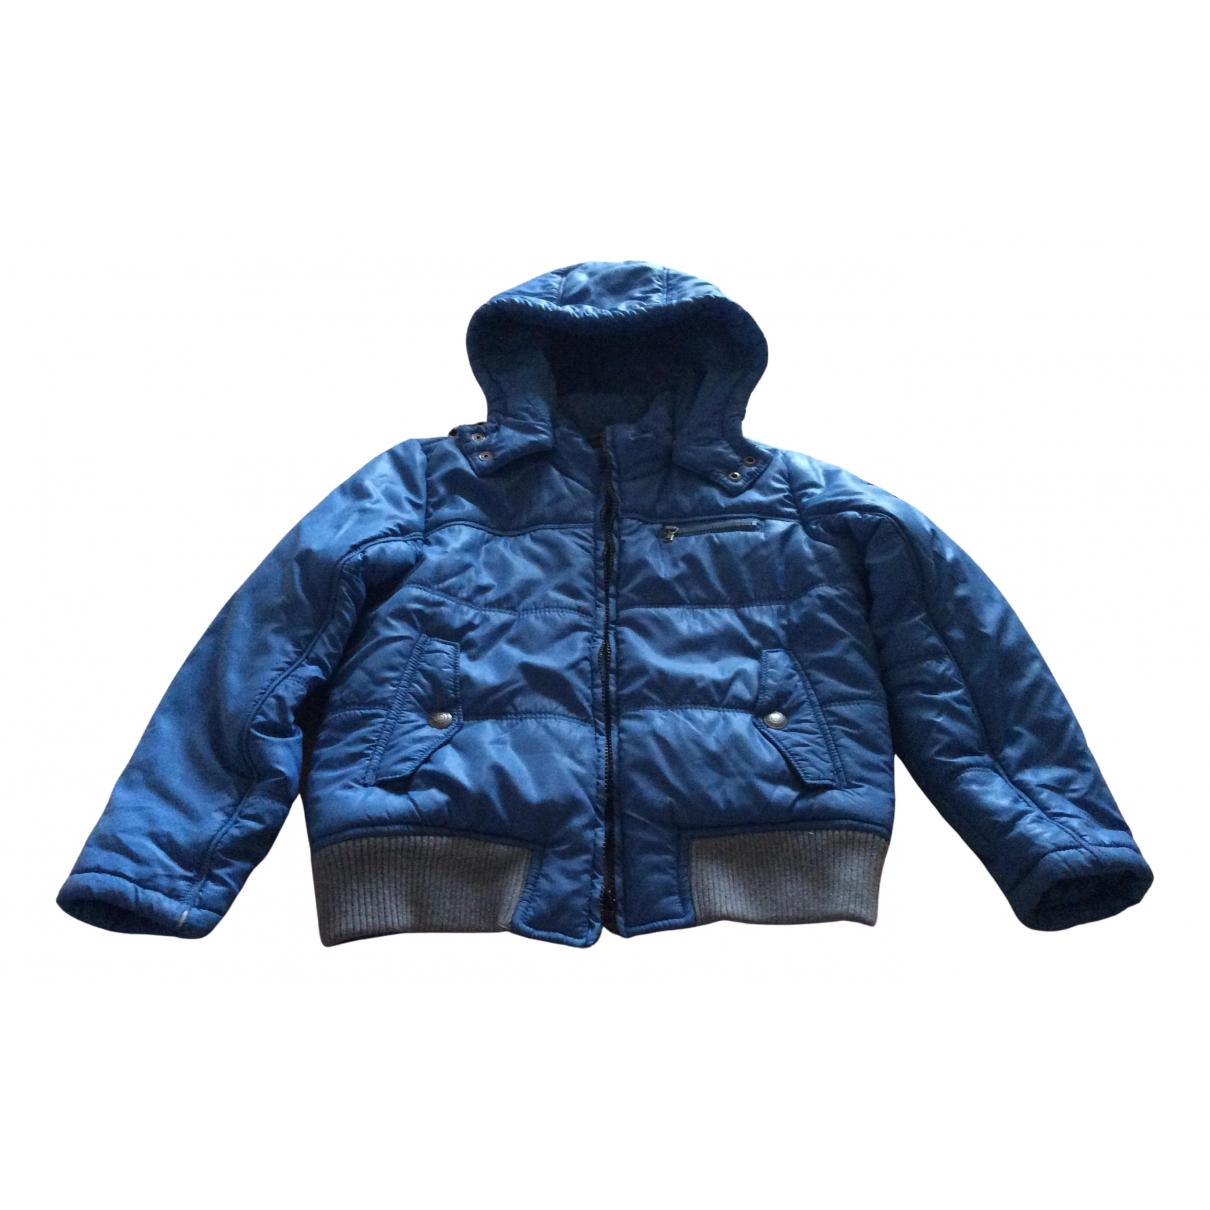 Calvin Klein \N Jacke, Maentel in  Blau Polyester